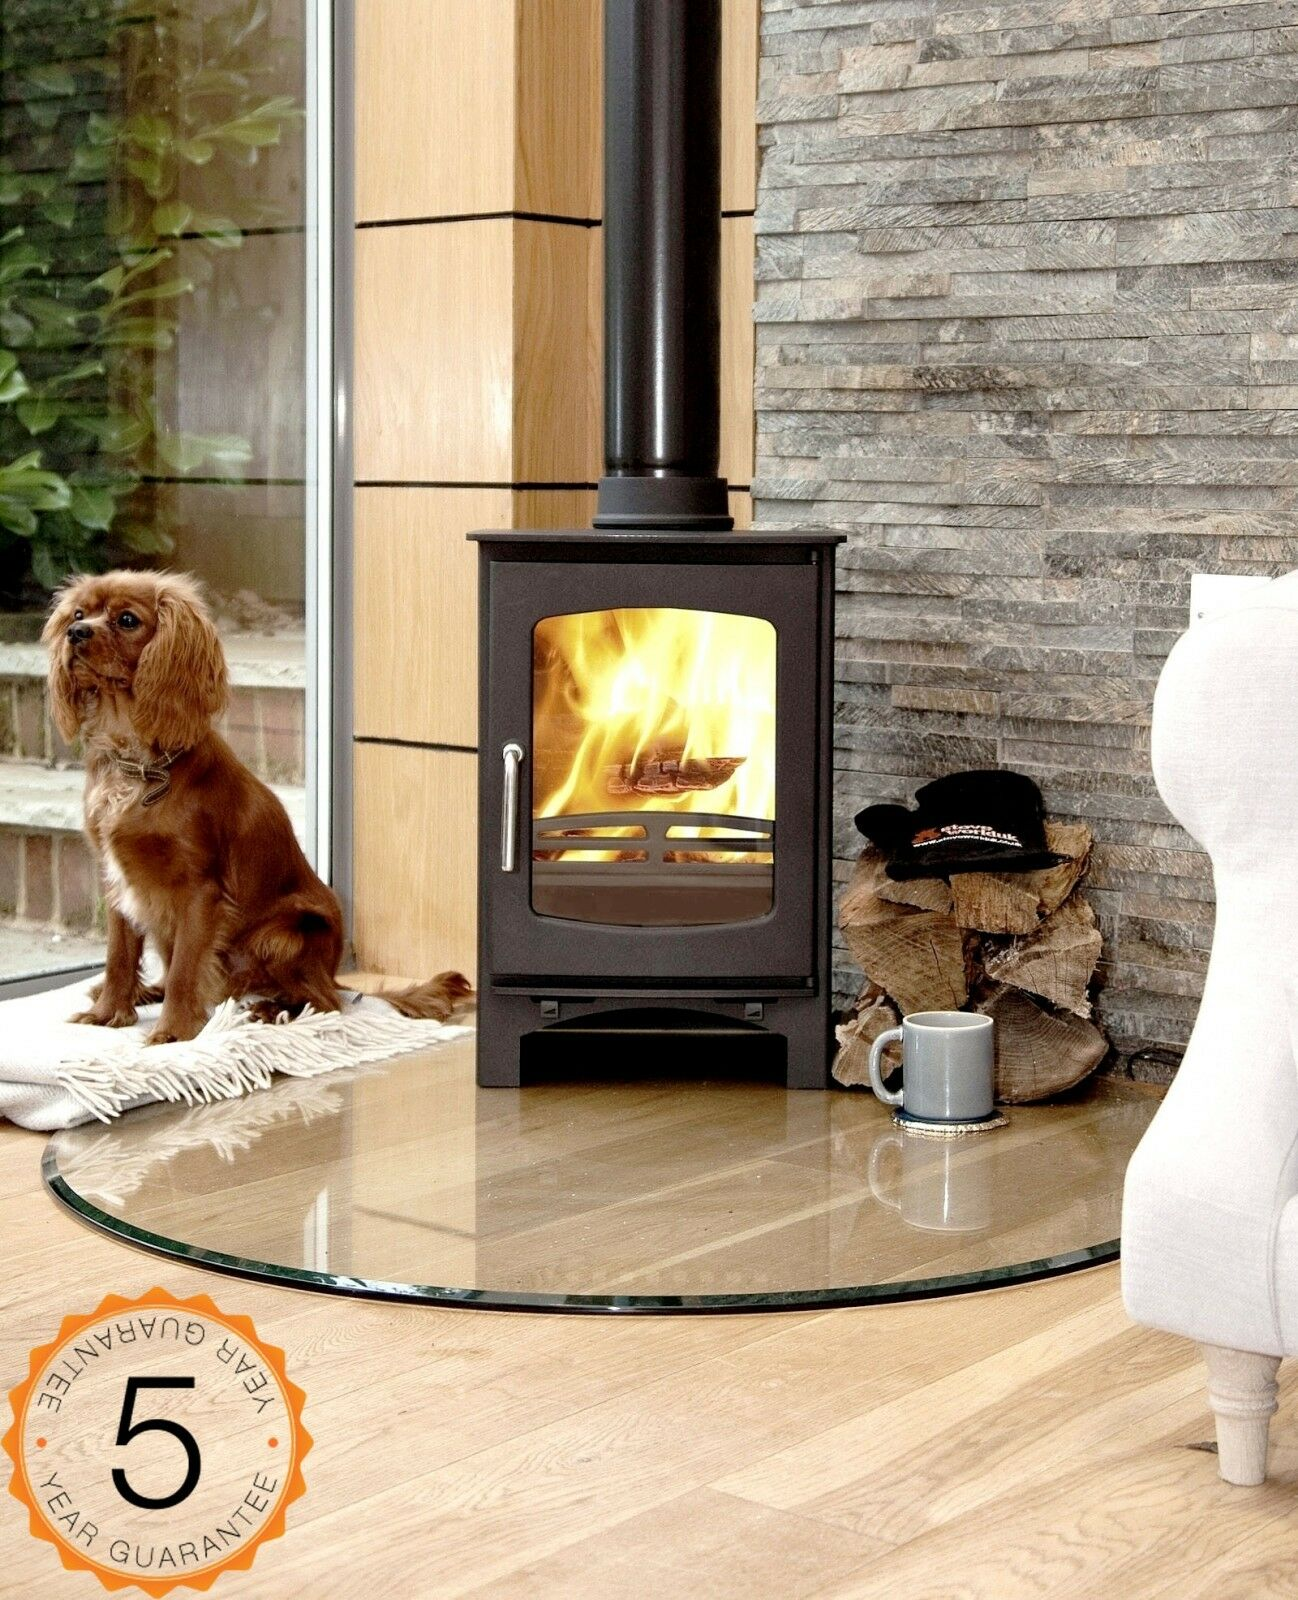 85 efficent purefire 5kw curve multi fuel woodburning. Black Bedroom Furniture Sets. Home Design Ideas